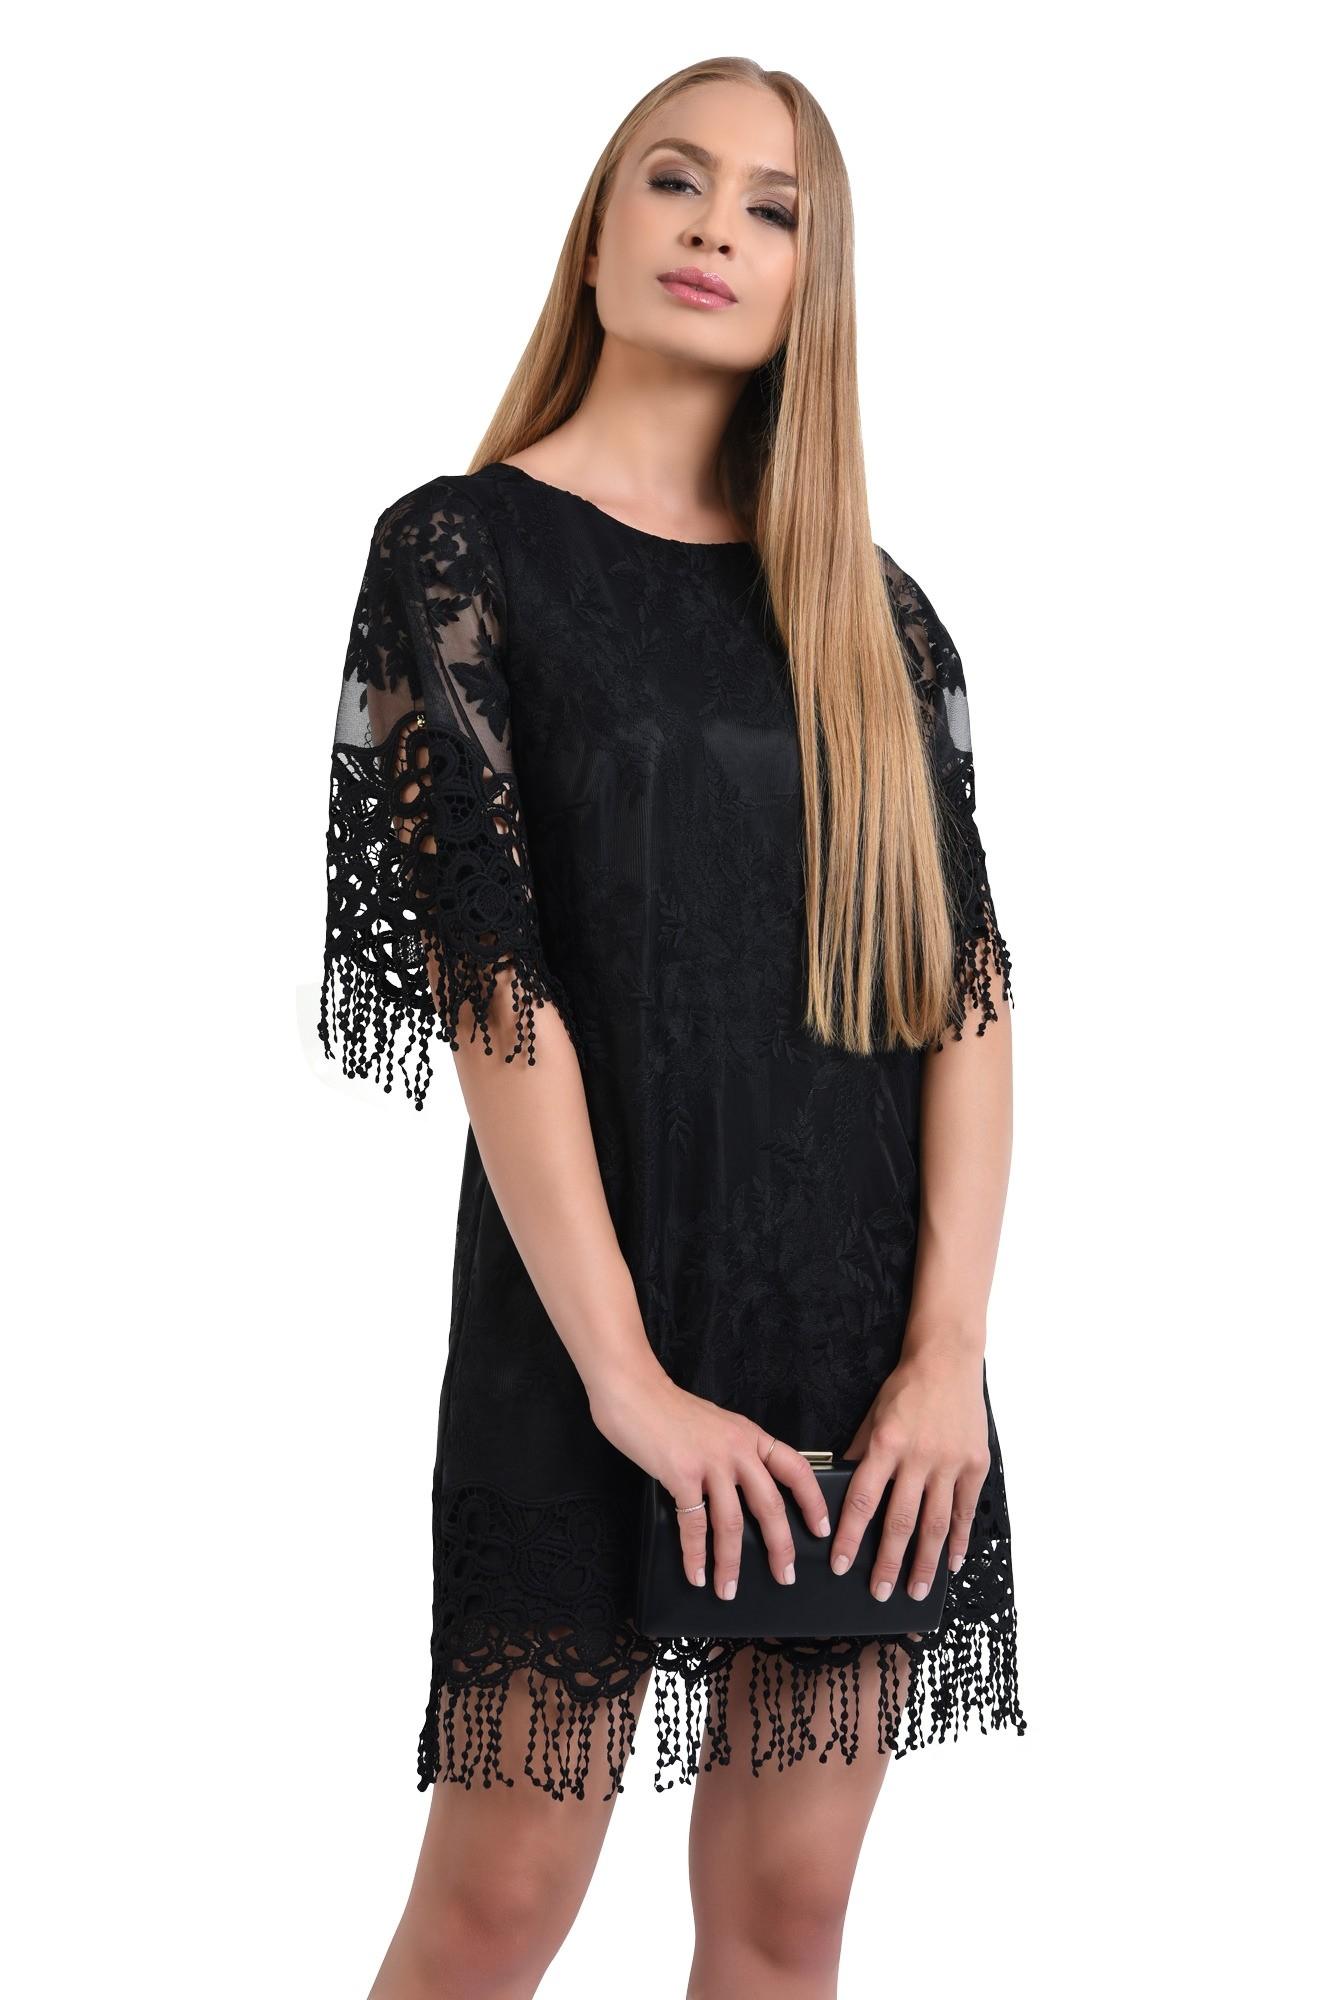 2 - rochie eleganta, dantela brodata, franjuri, rochii online